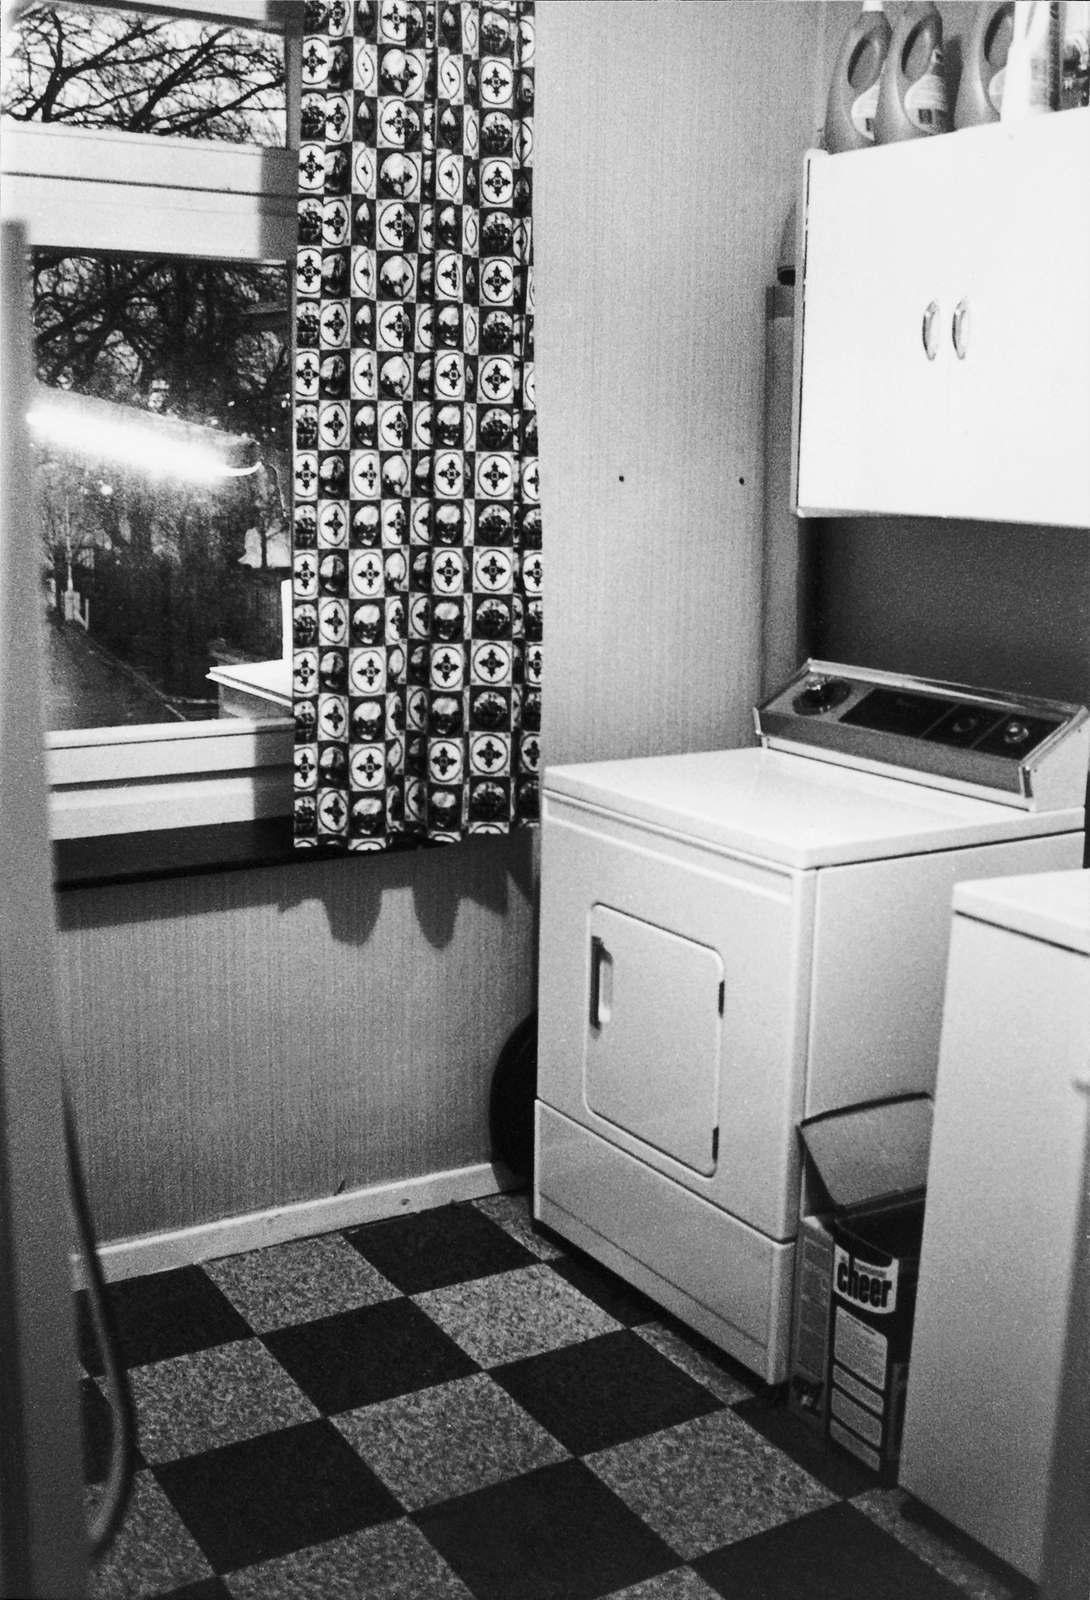 Hamburg - Temporary Duty/Transient Residential Unit - 1978